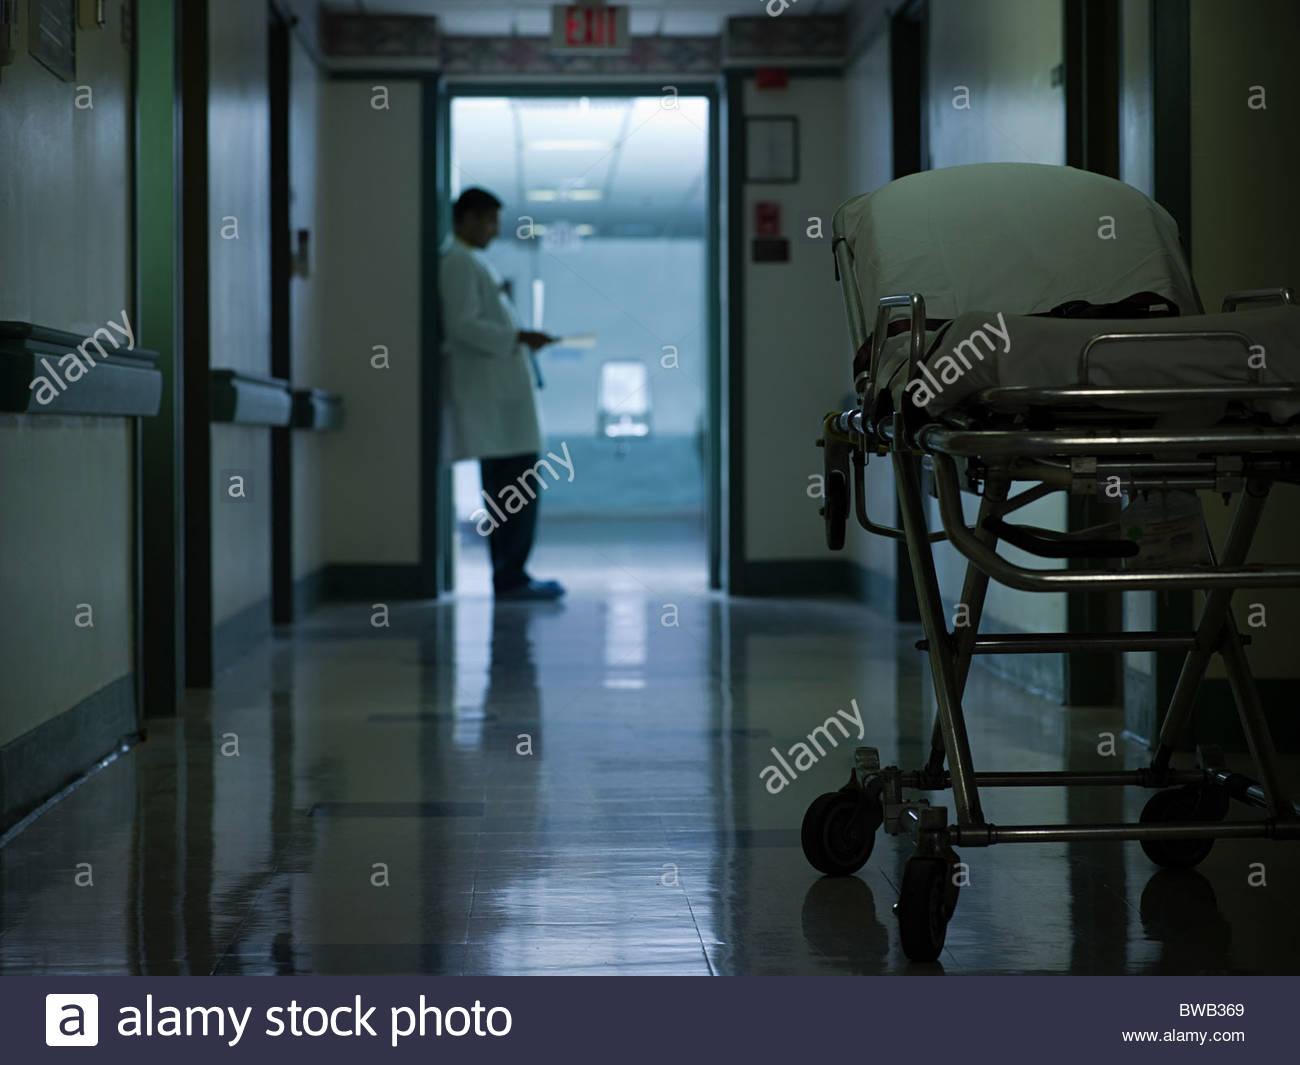 Male doctor in hospital corridor - Stock Image